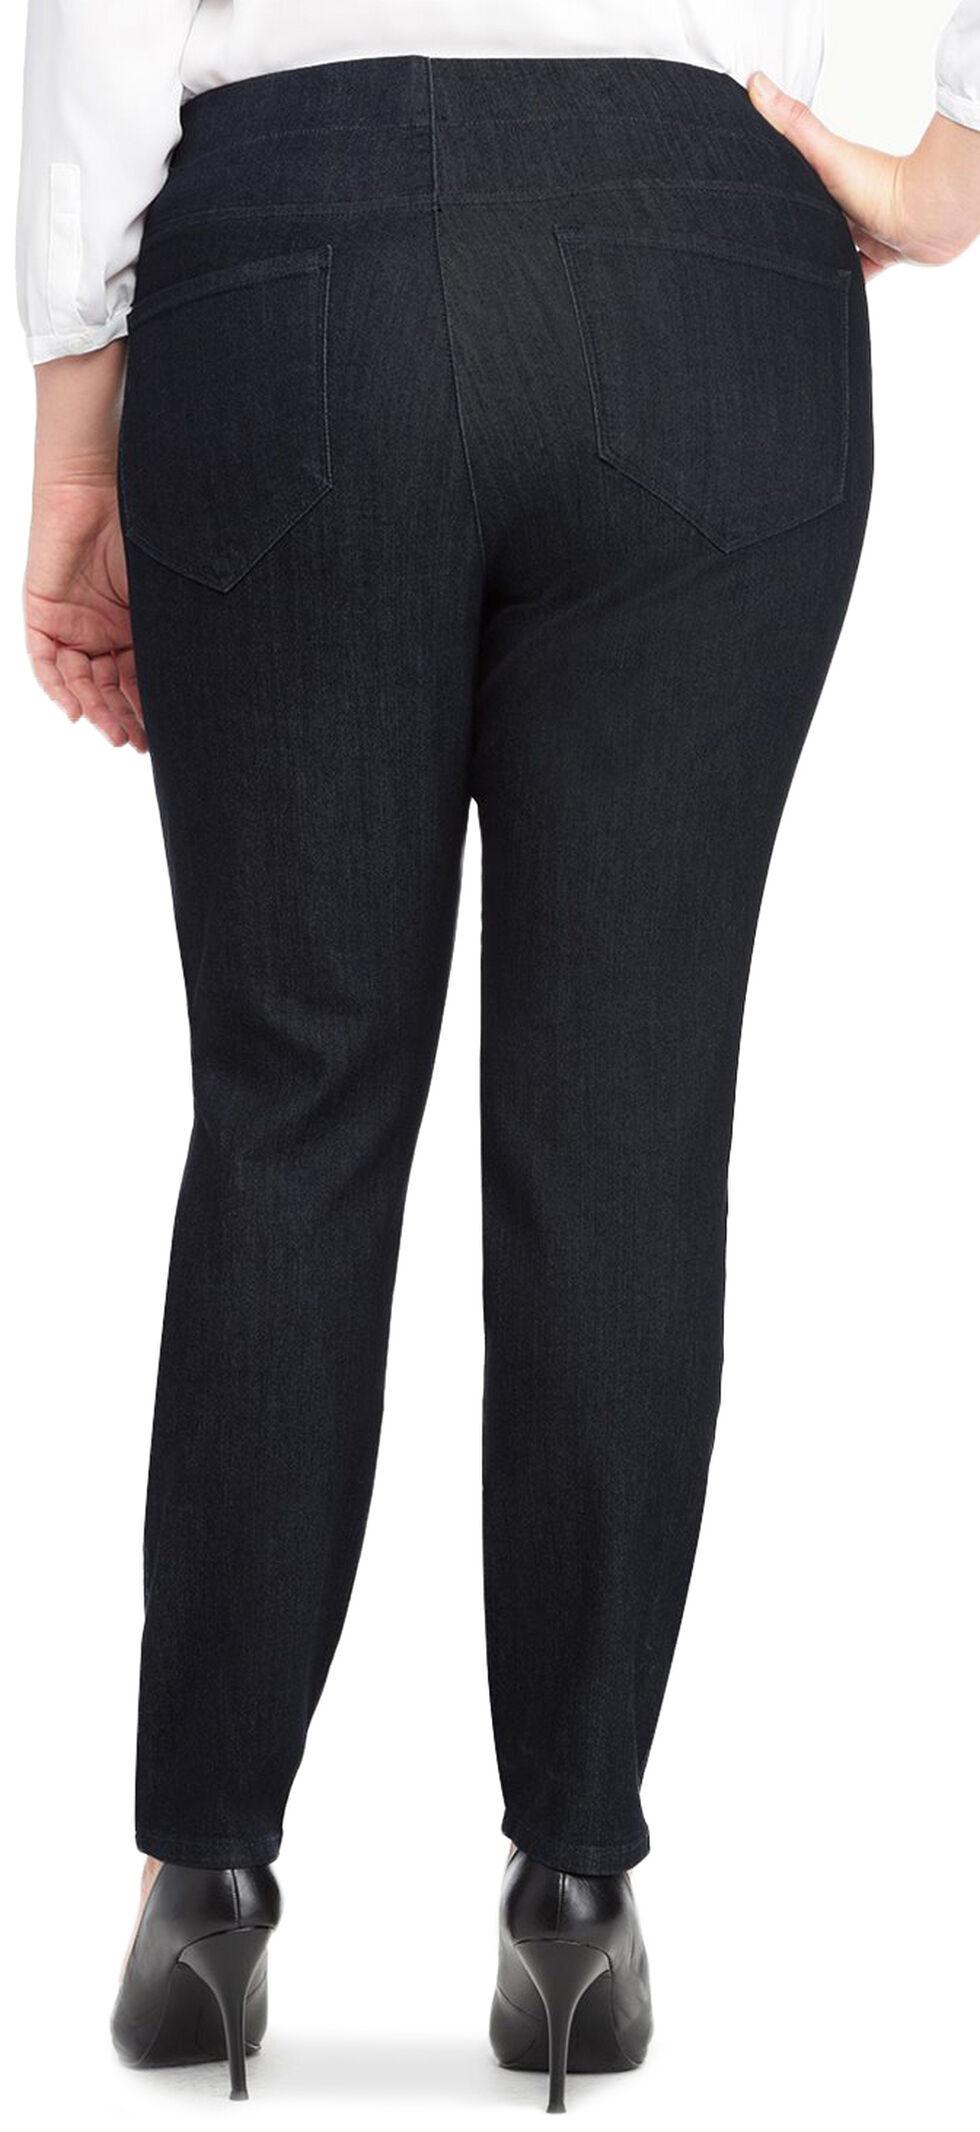 NYDJ Women's Poppy Pull-On Legging Jeans - Plus, Indigo, hi-res